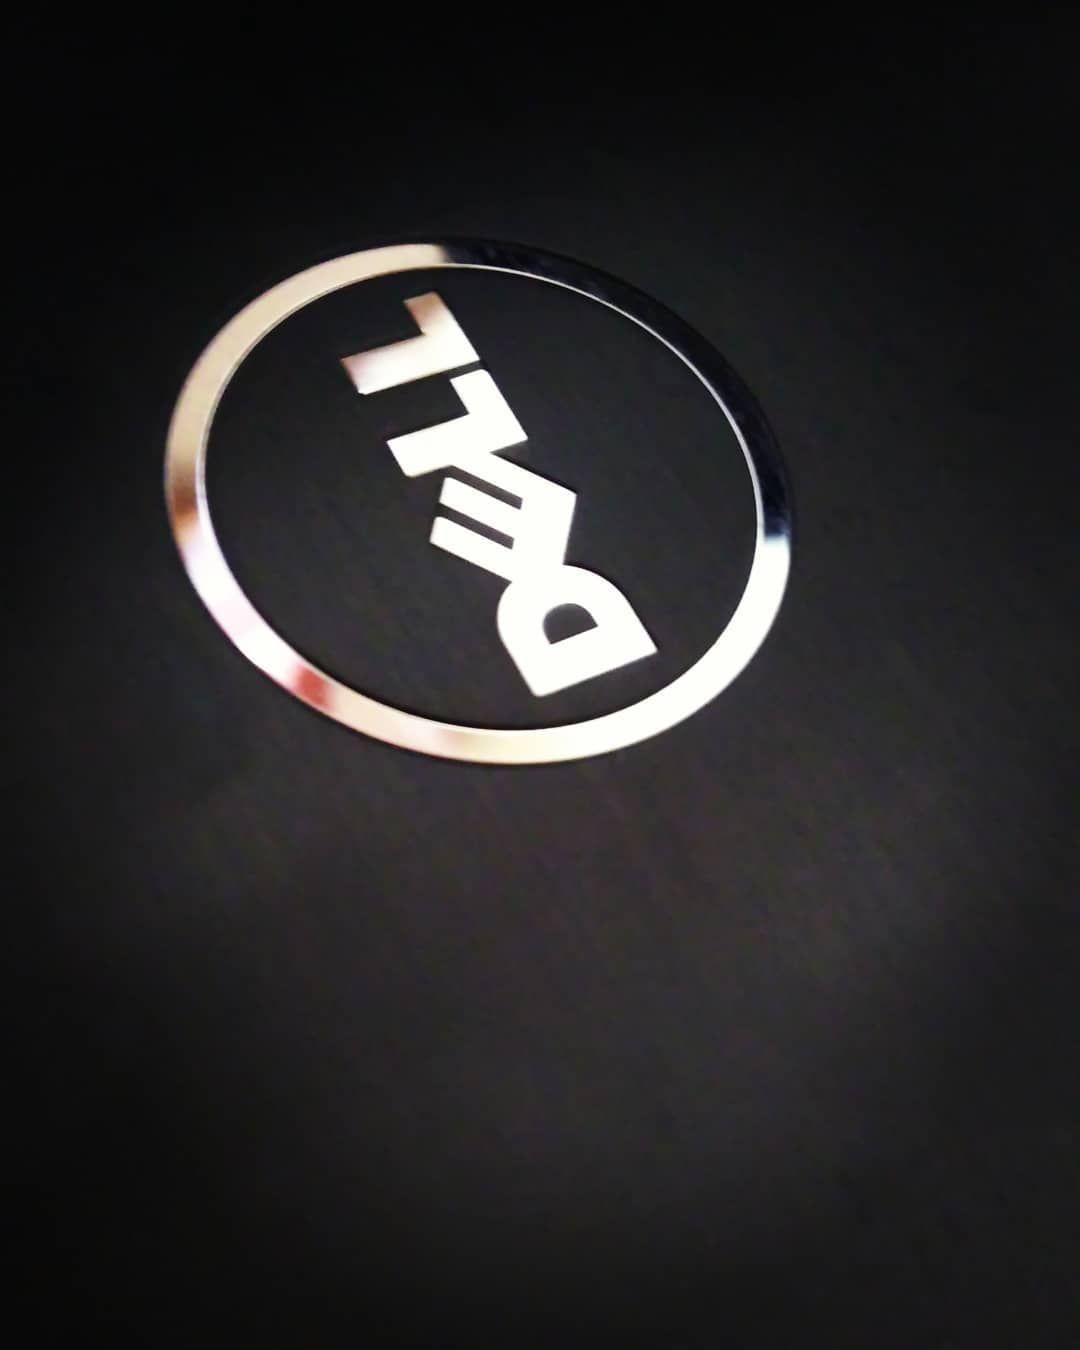 ubuntu home office. #logo #rigeservice @dell #ubuntu #dell #dellcompany #pc #notebook Ubuntu Home Office